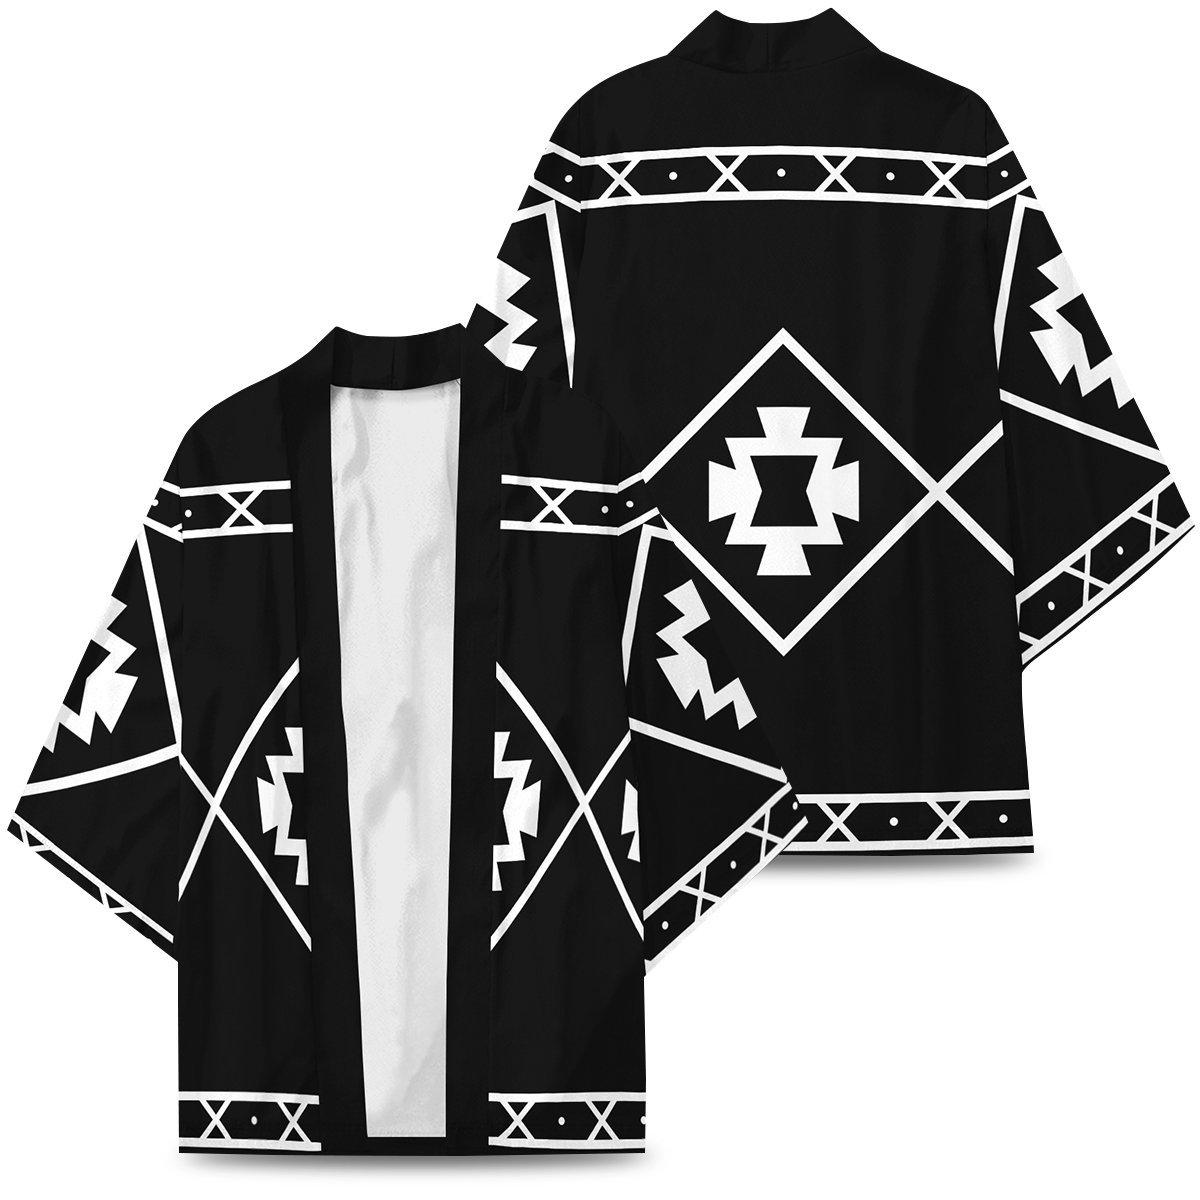 draken v2 kimono 382628 - Otaku Treat